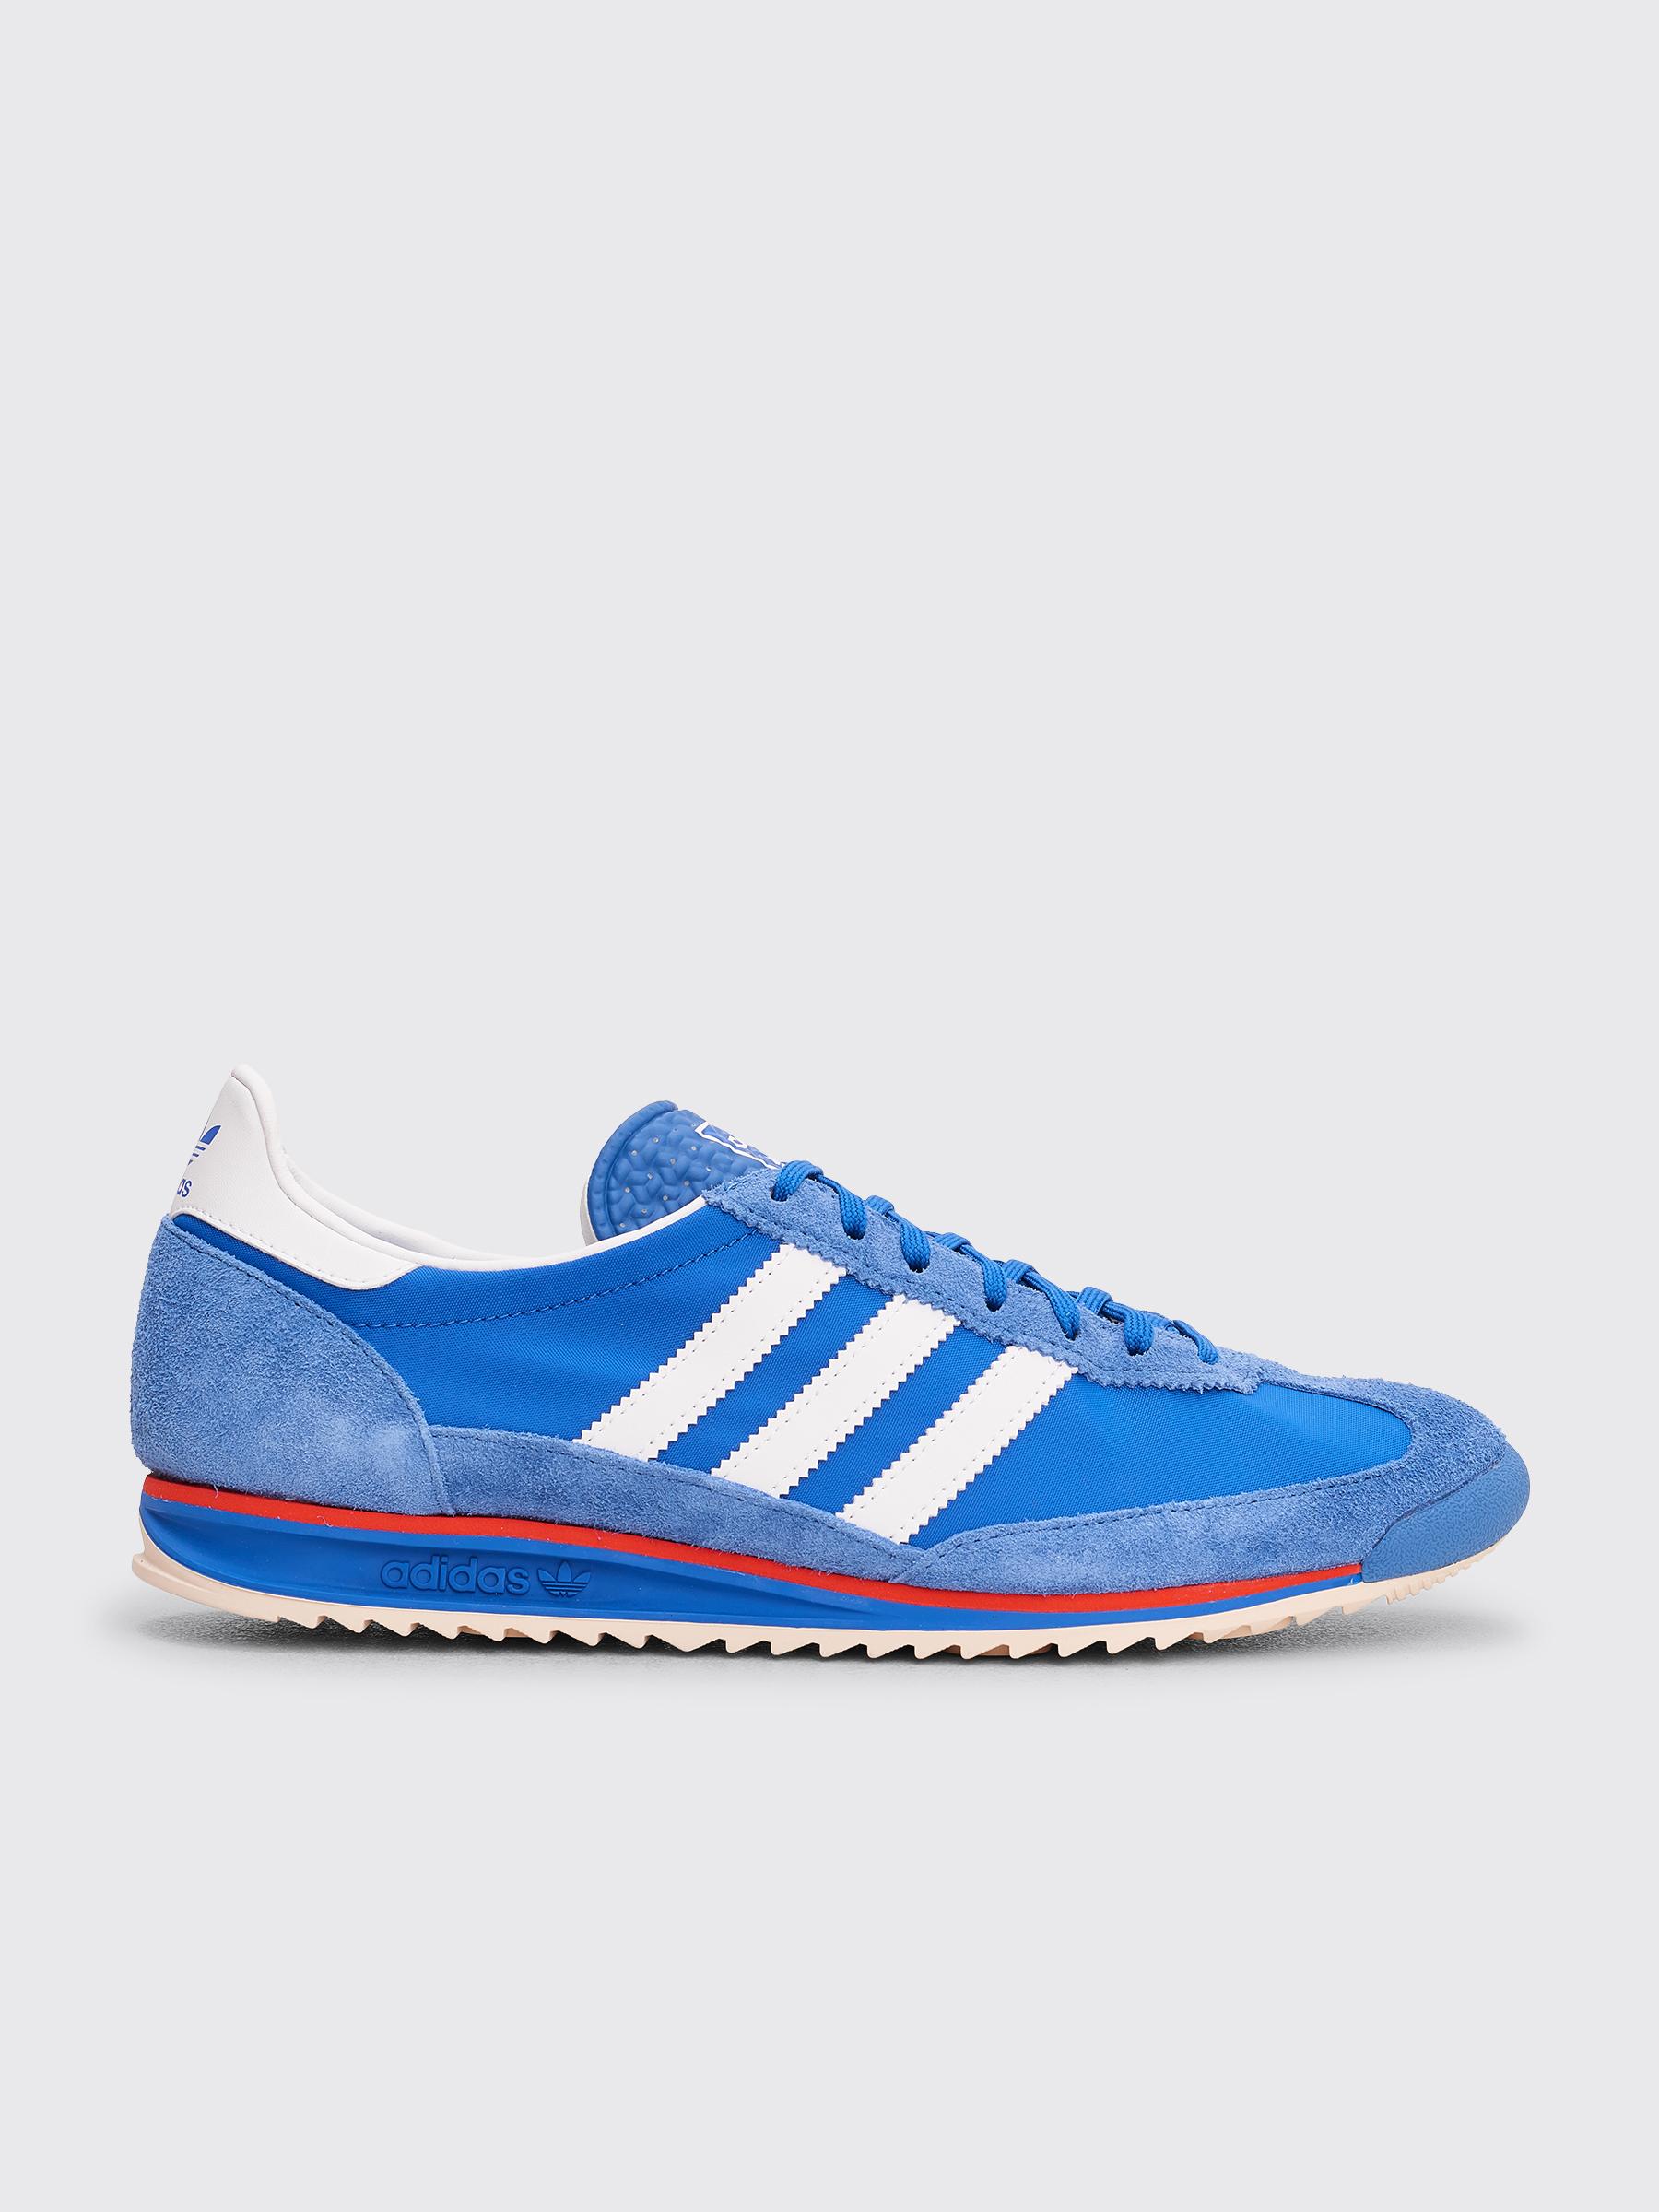 adidas Originals SL 72: GreenOrange   Adidas sneakers